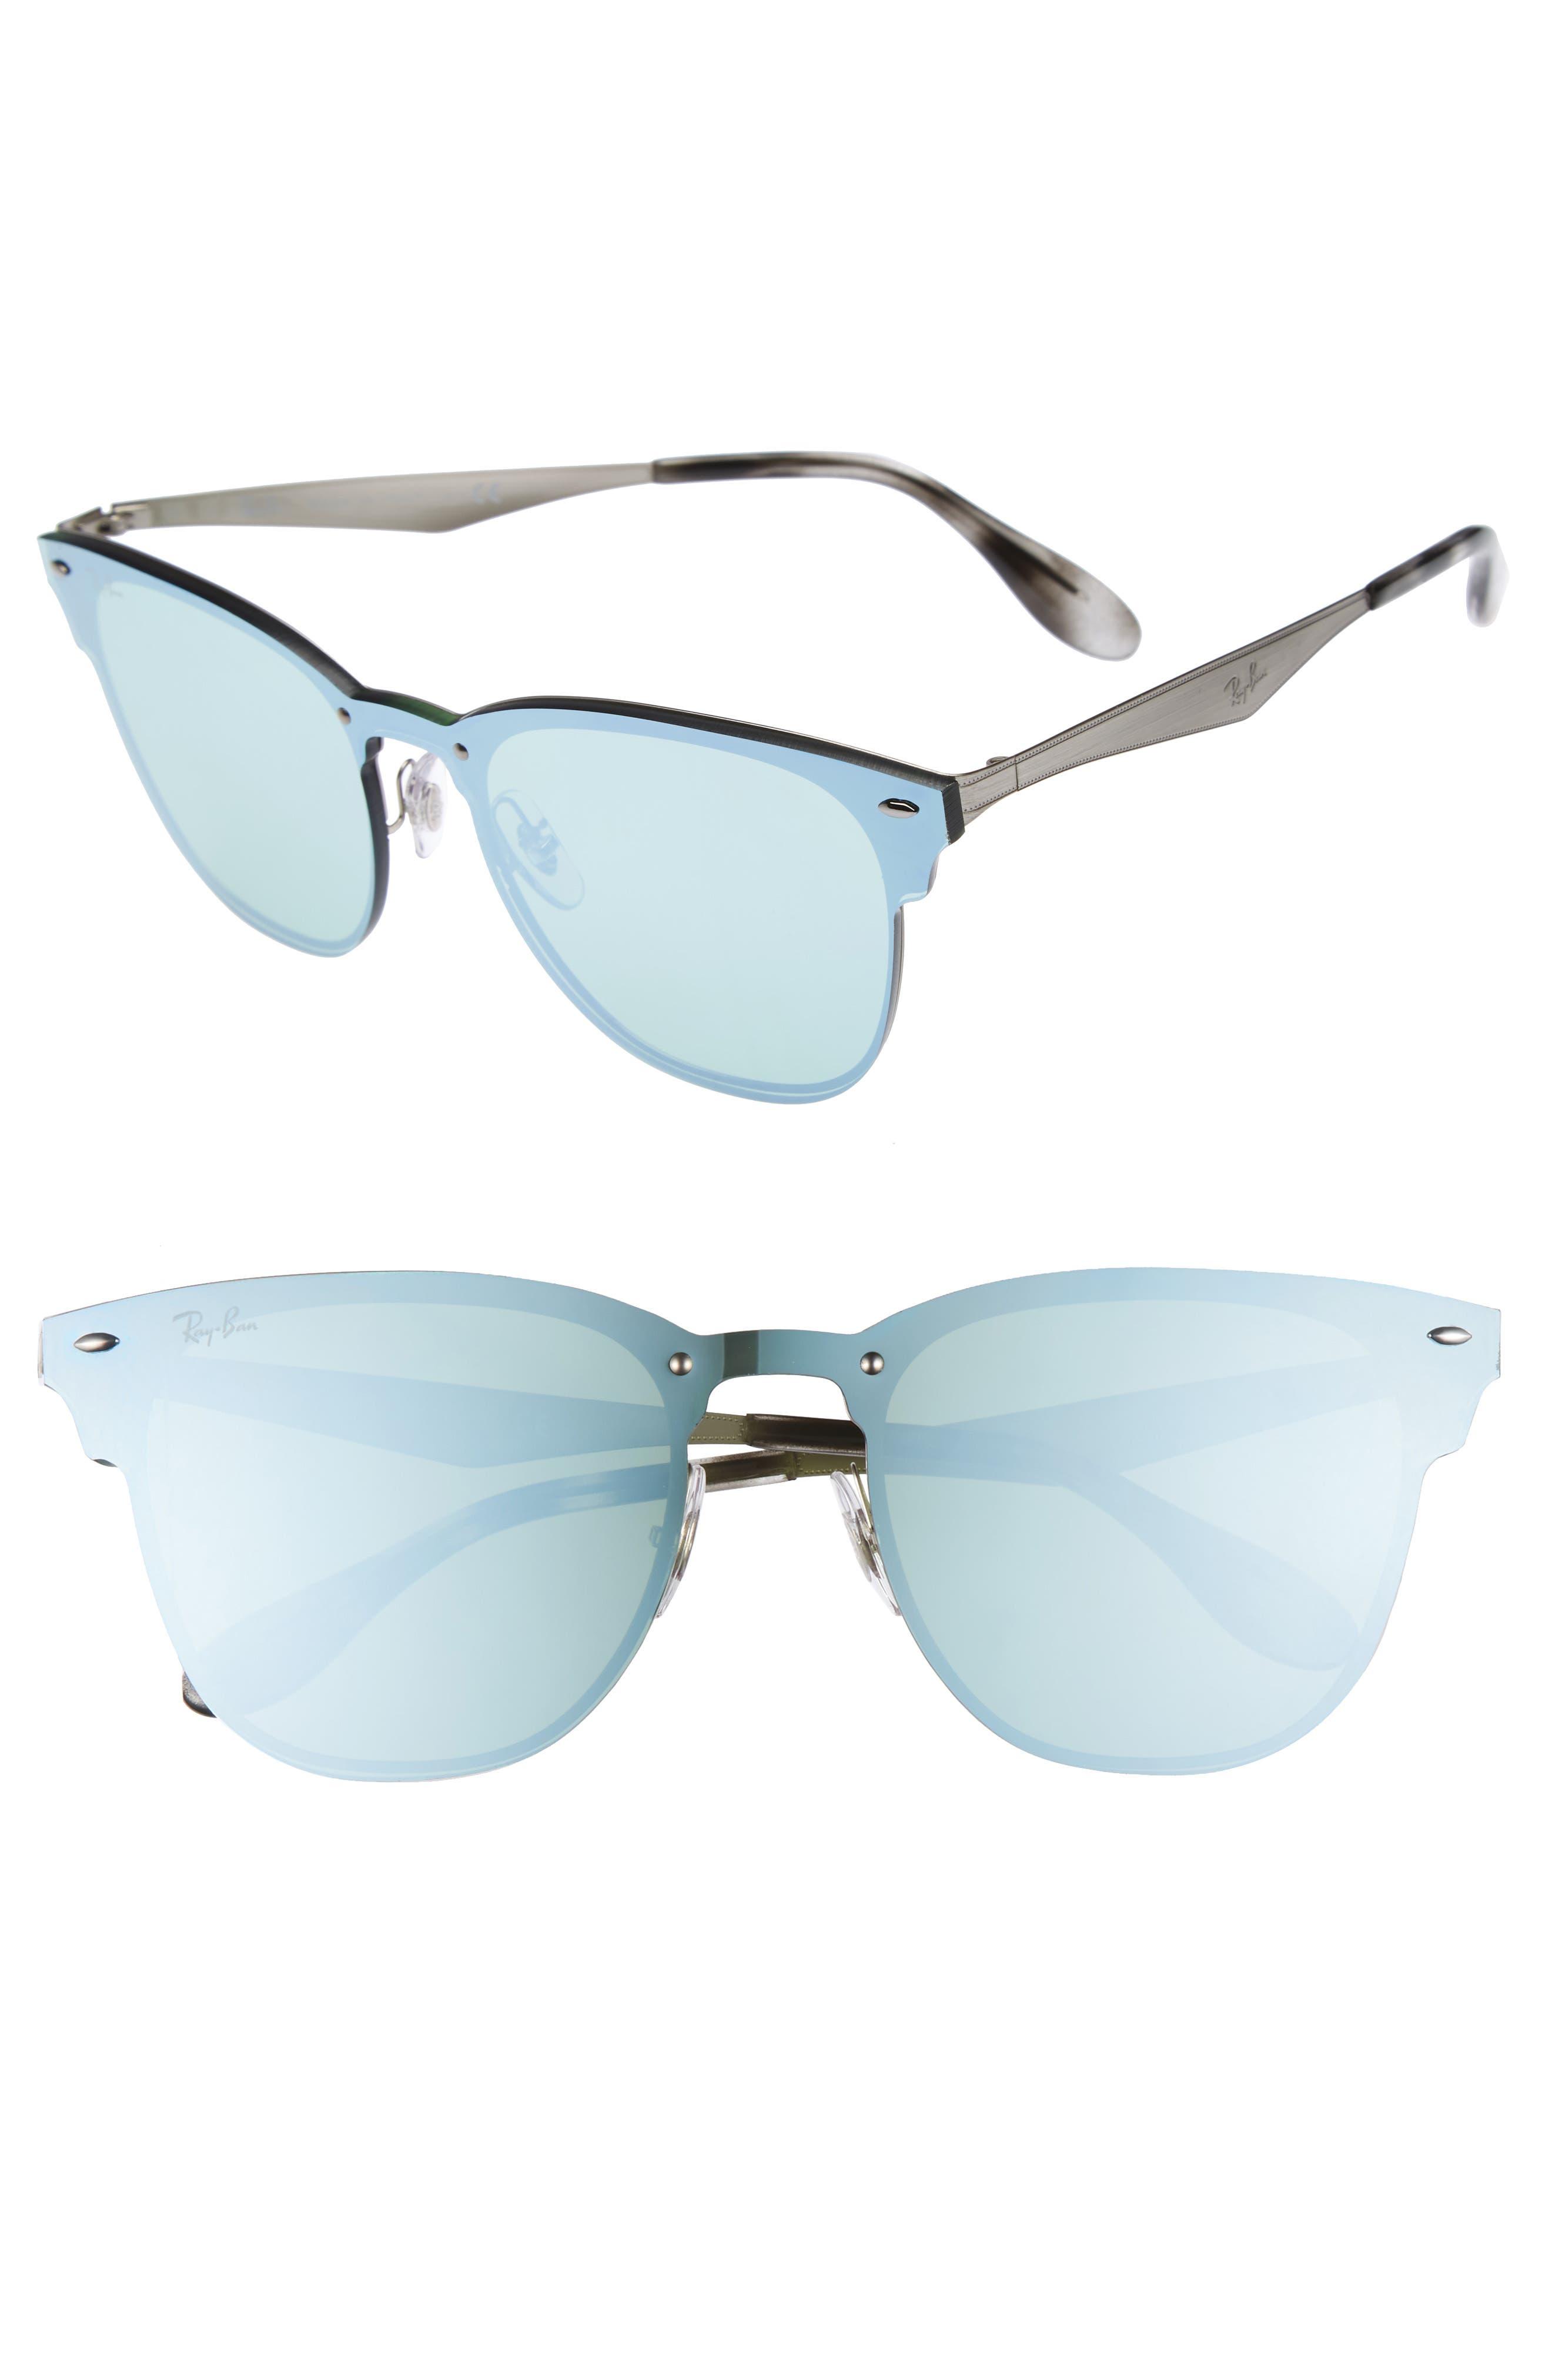 52mm Mirrored Sunglasses,                             Main thumbnail 1, color,                             040